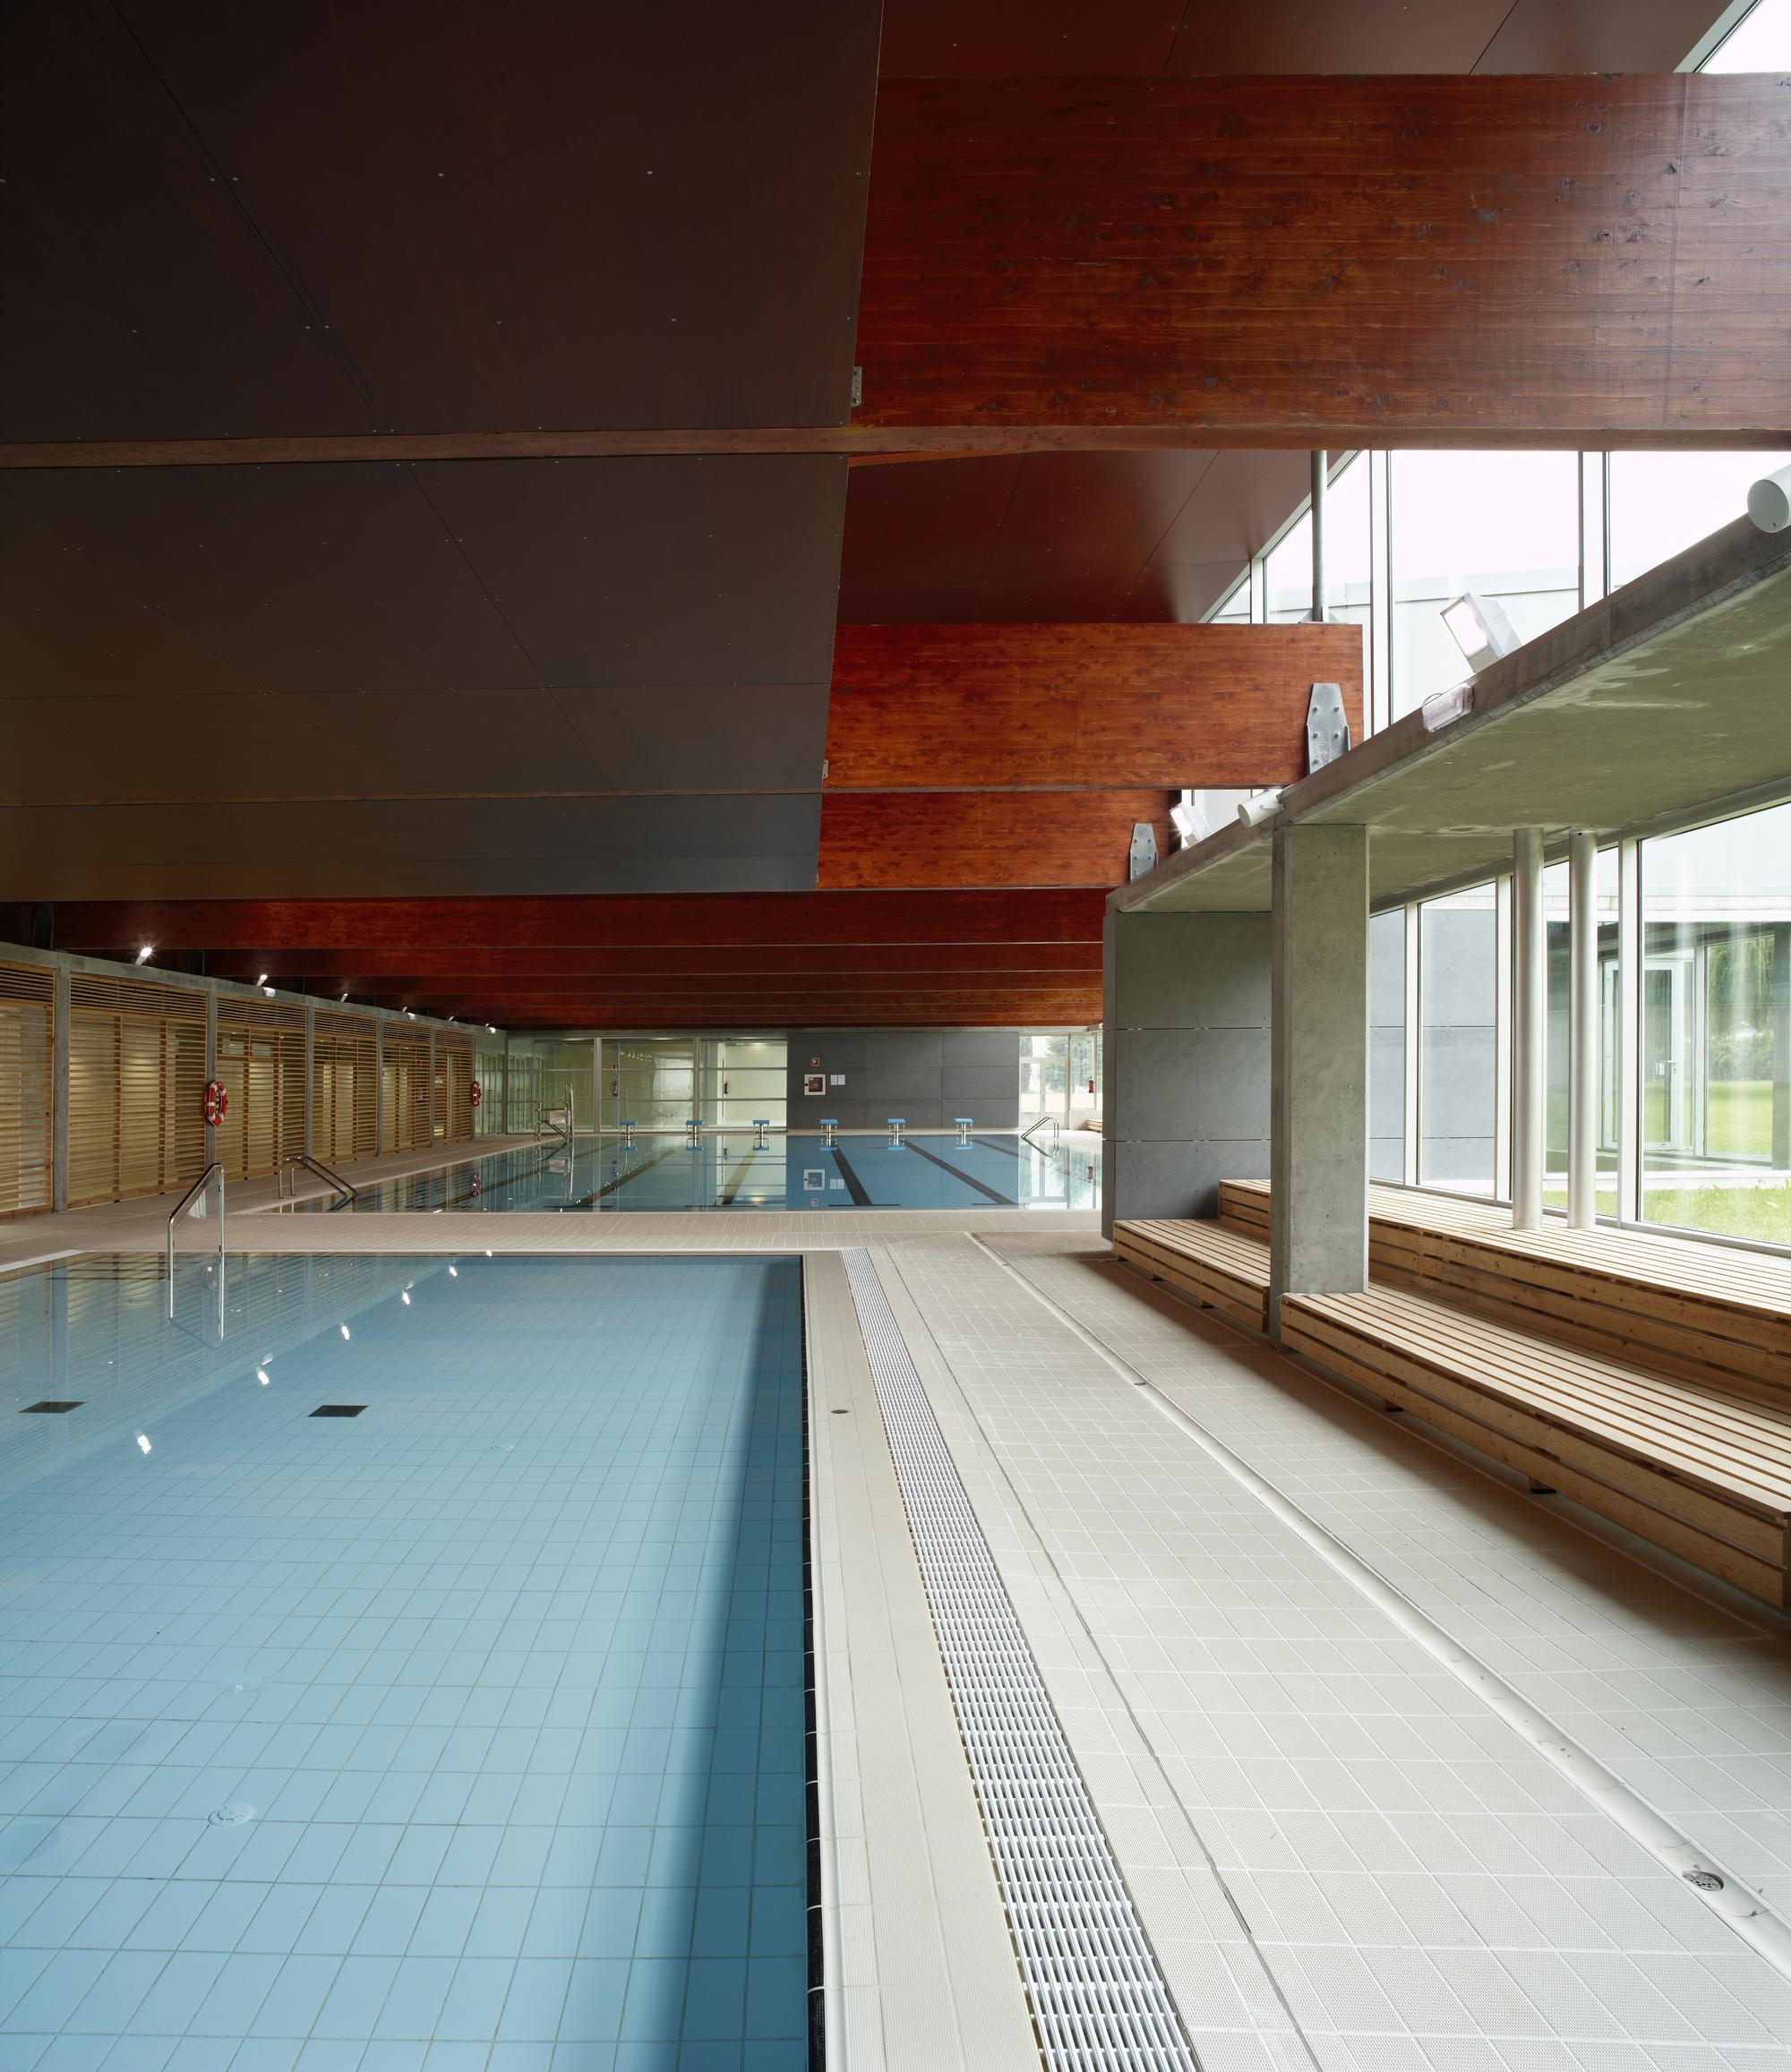 Rogelio Ruiz Fern Ndez Oficina Plataforma Arquitectura # Muebles Rogelio Gonzalez